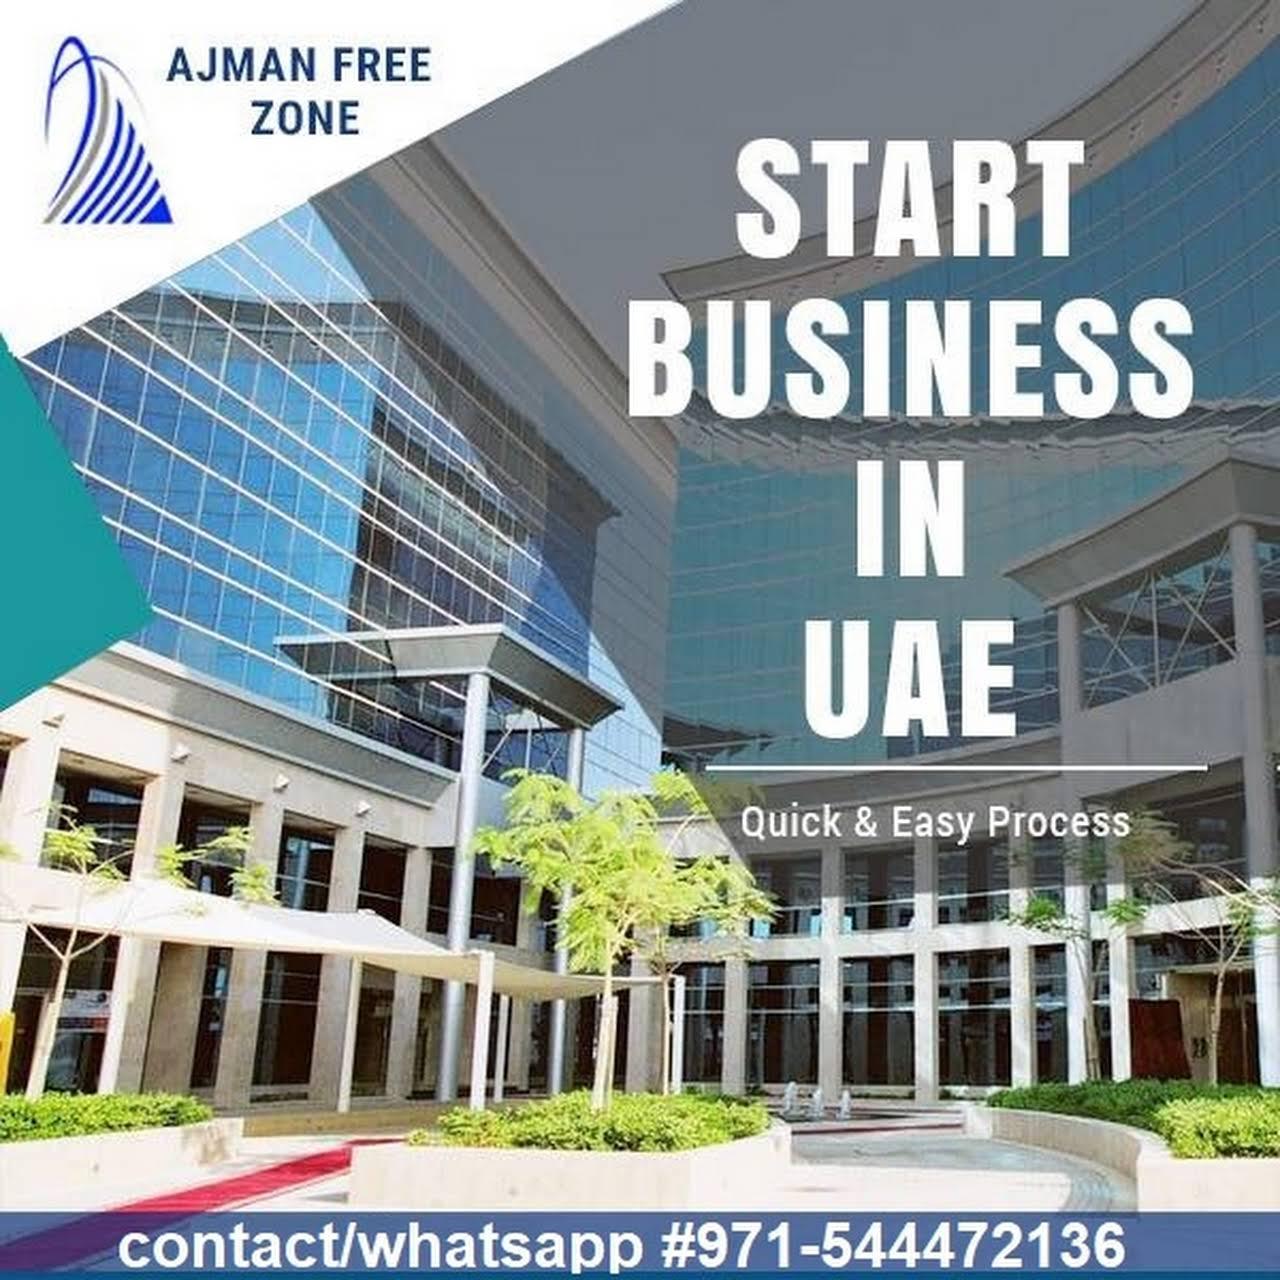 USH International Businessmen Services LLC - Business